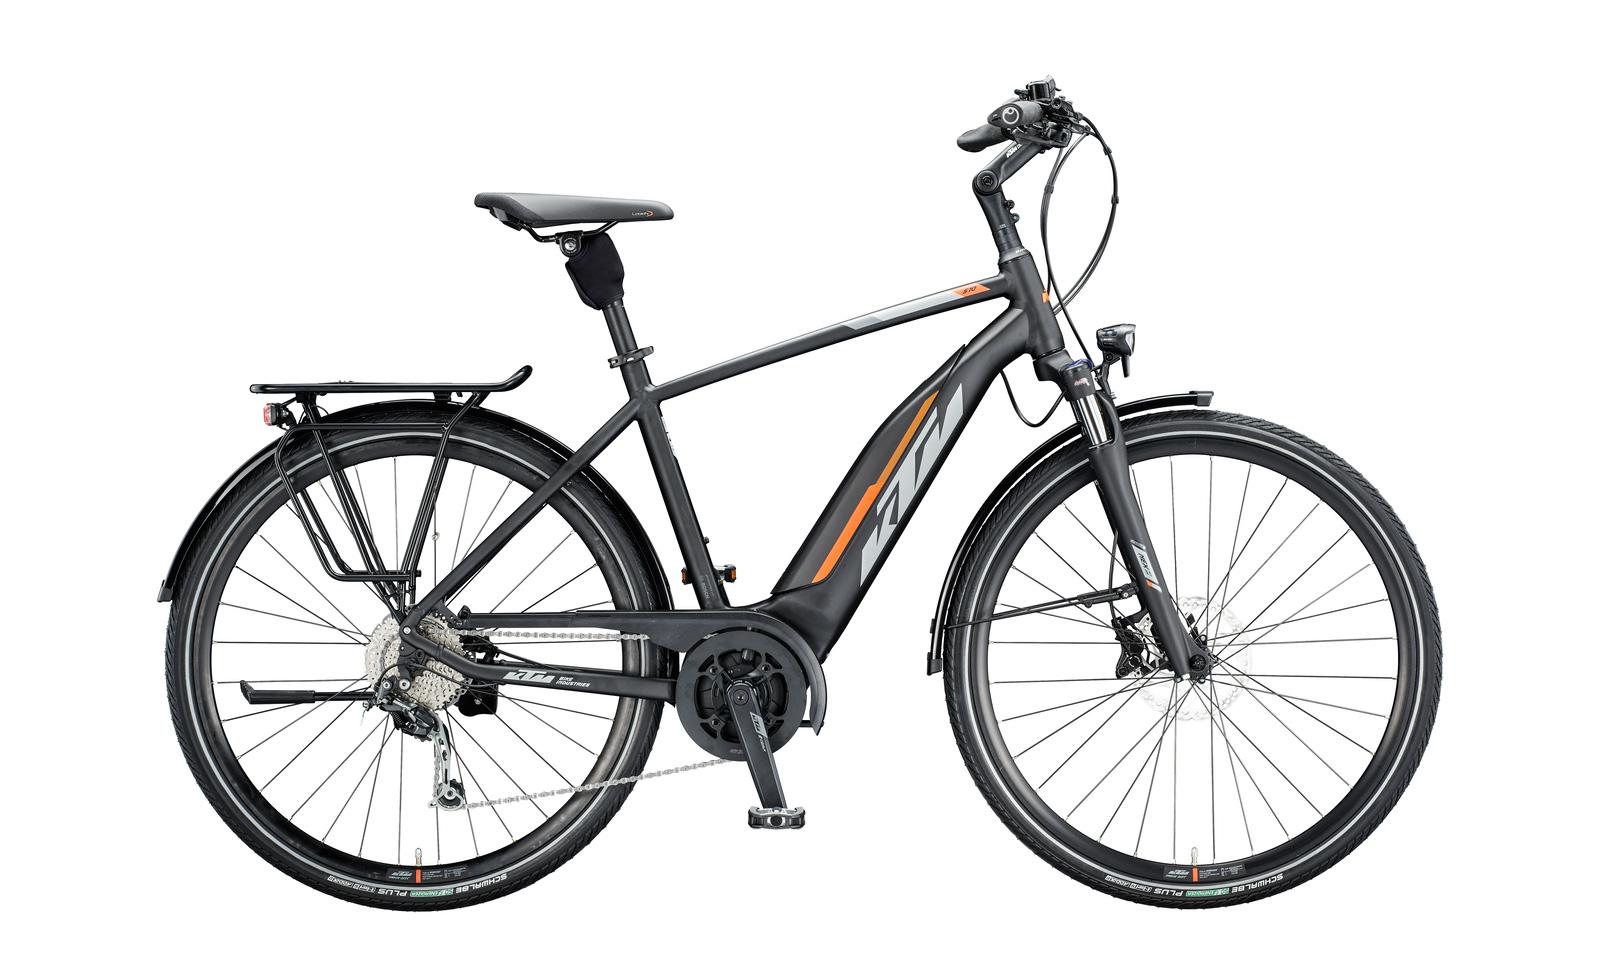 Biciclete electrice KTM E-Onroad MACINA FUN 510 1x9 Shimano Deore